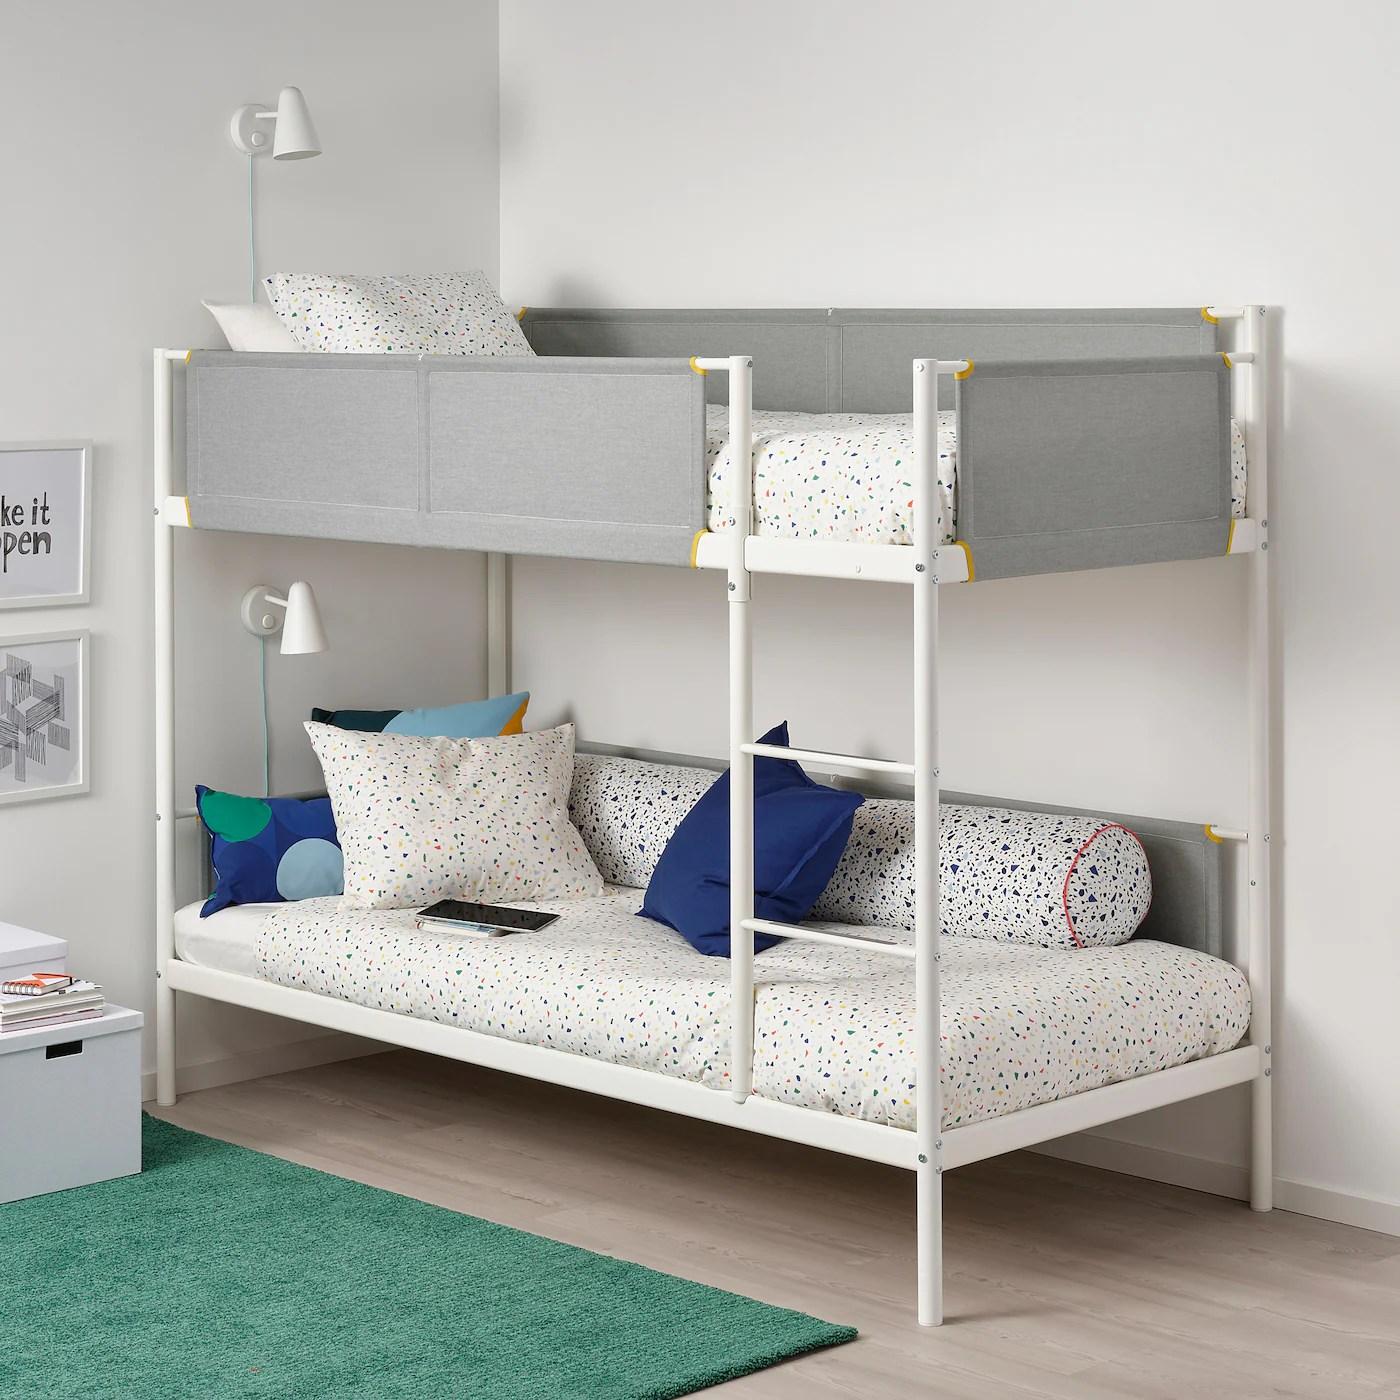 Ikea Vitval Loft Bed Instructions,Kitchen Cupboard Organizers Ideas